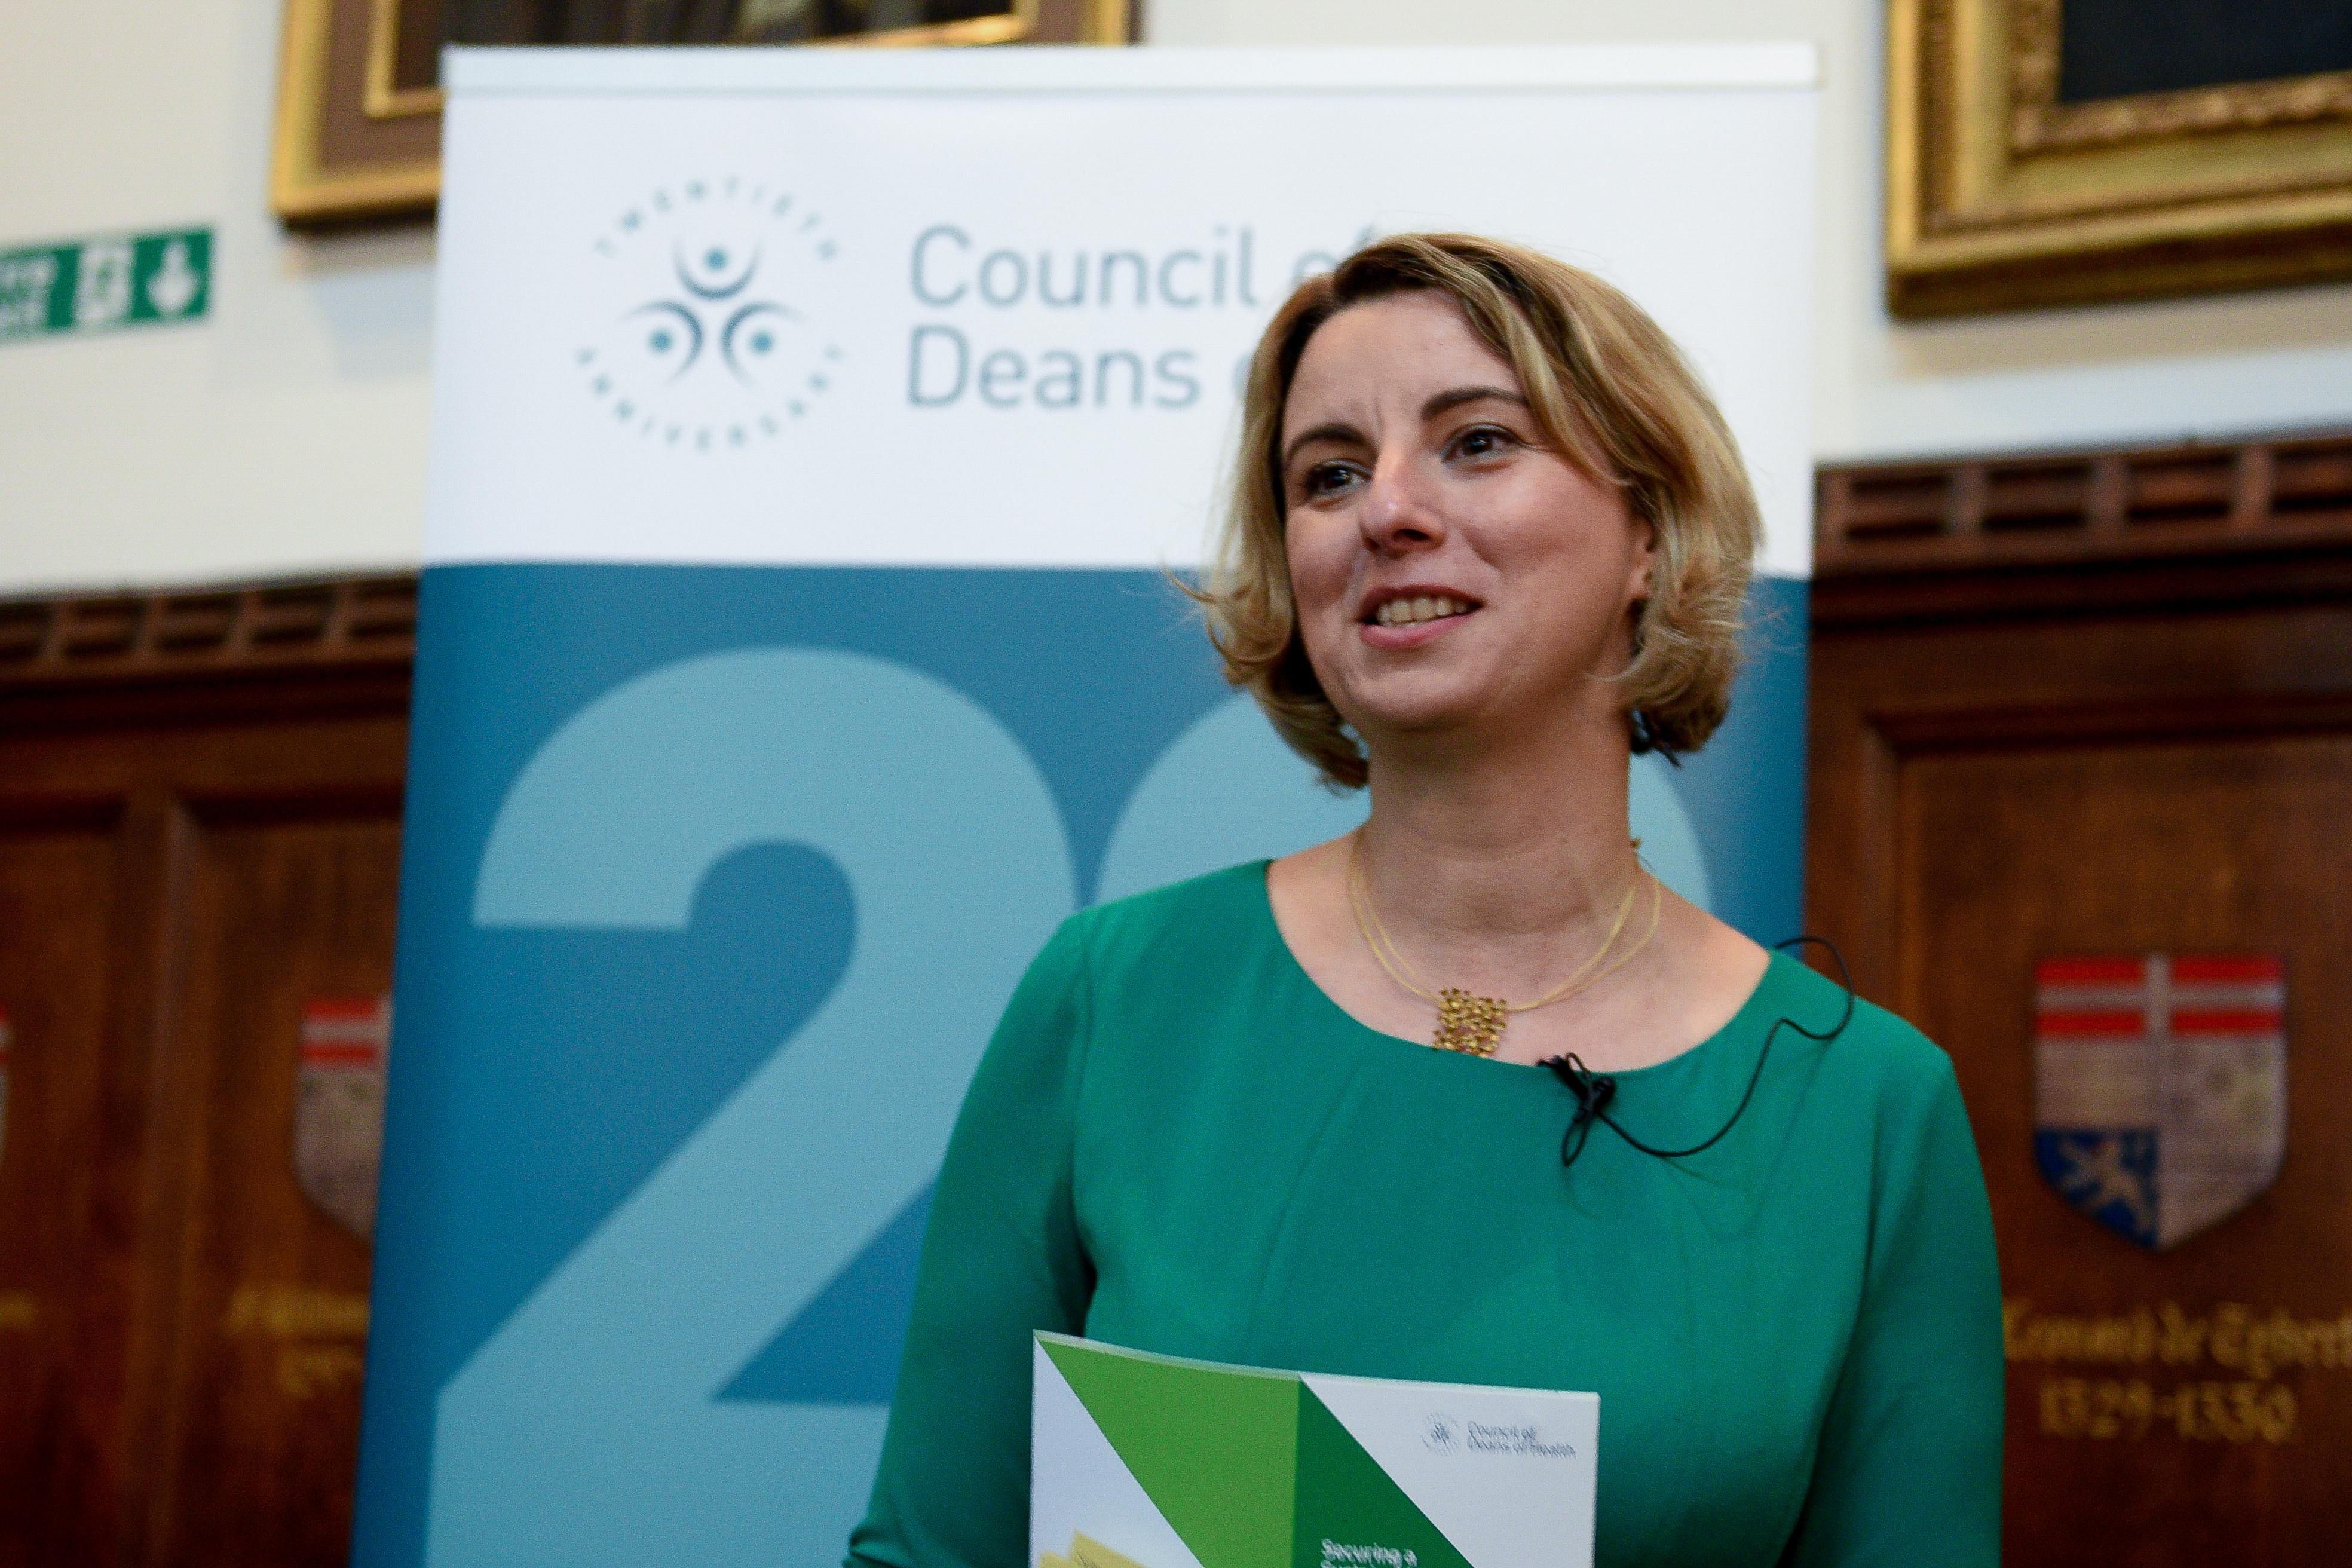 Katerina Kolyva - Council of Deans of Health